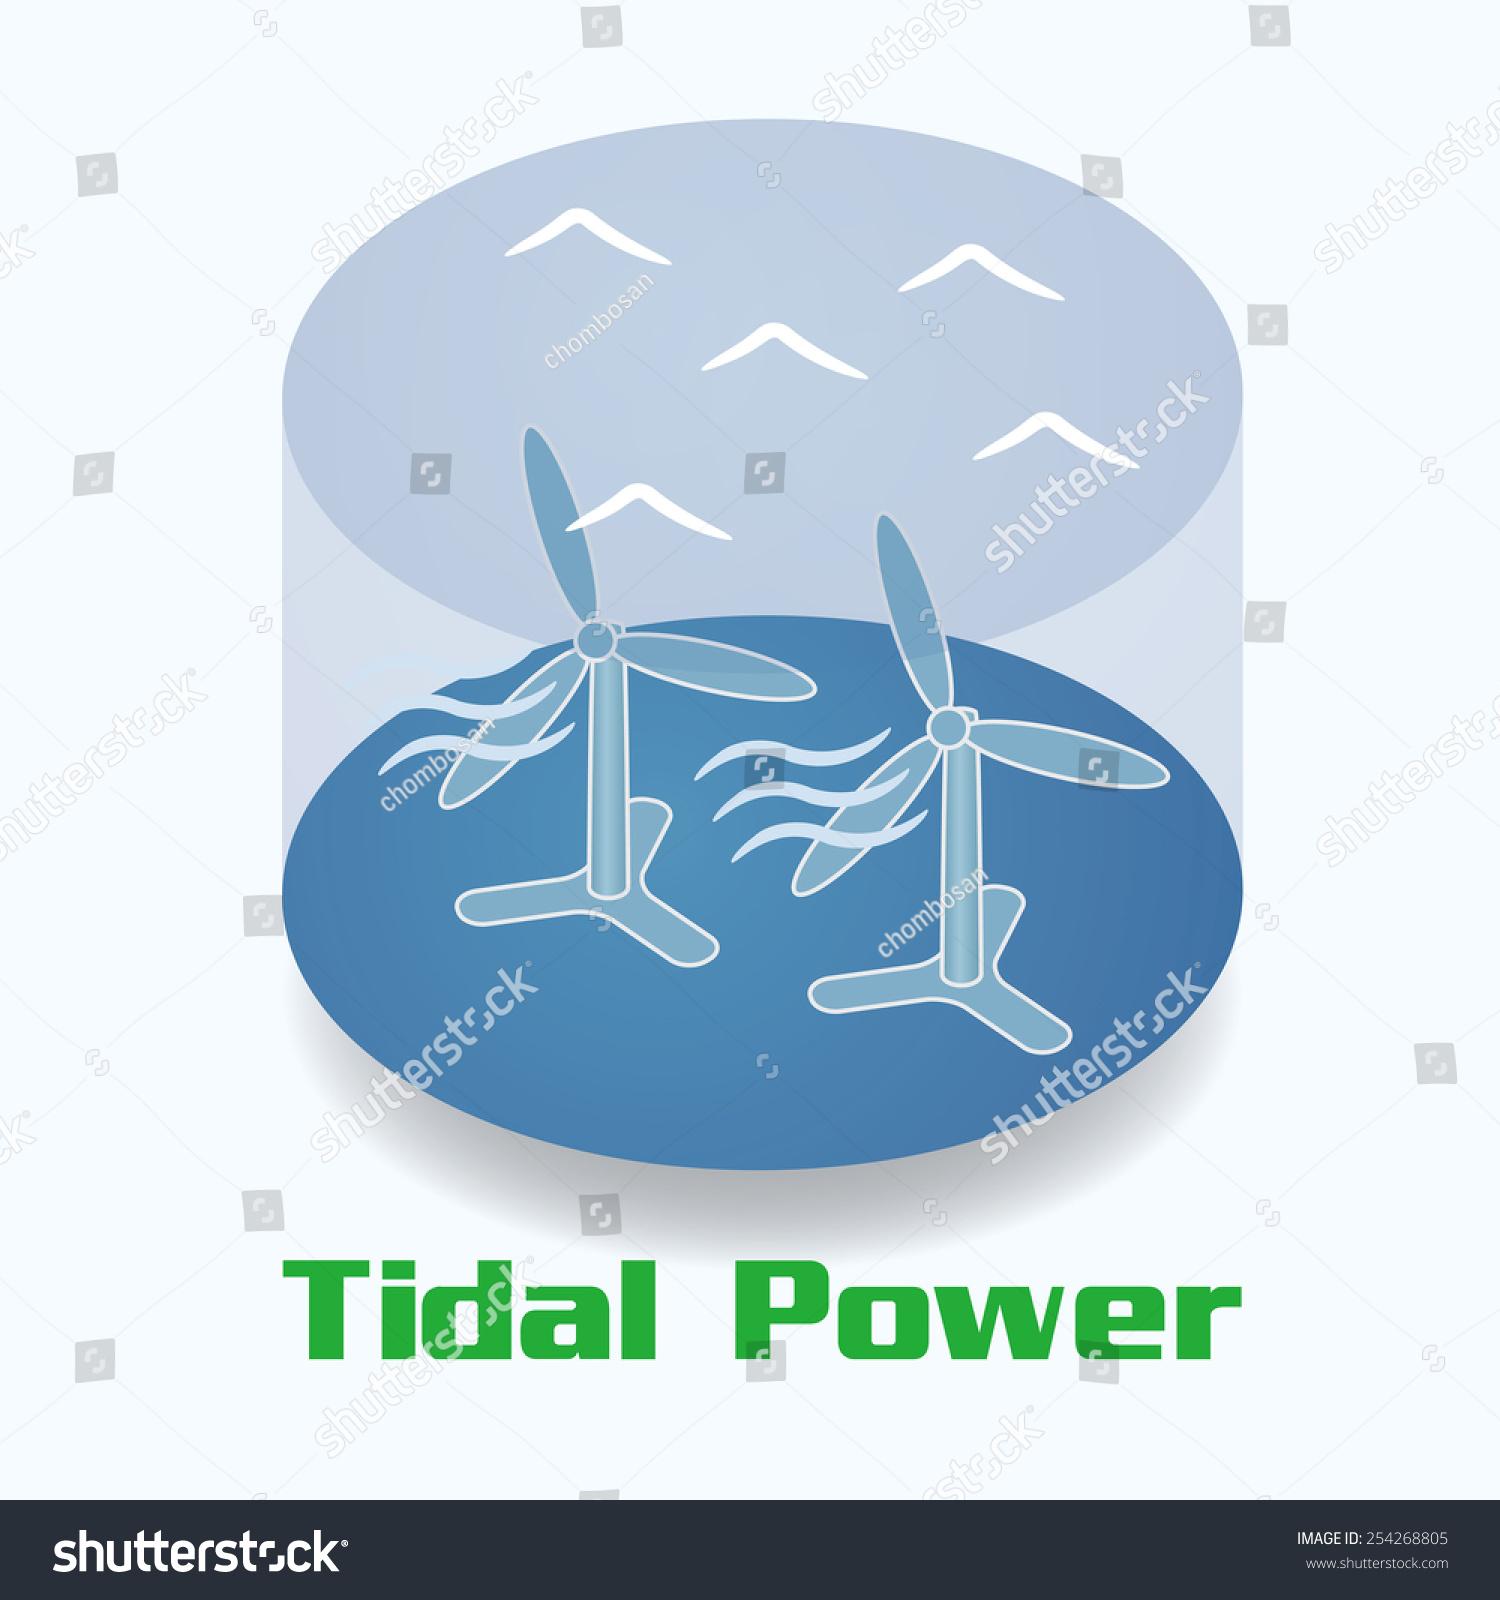 hight resolution of tidal power image illustration